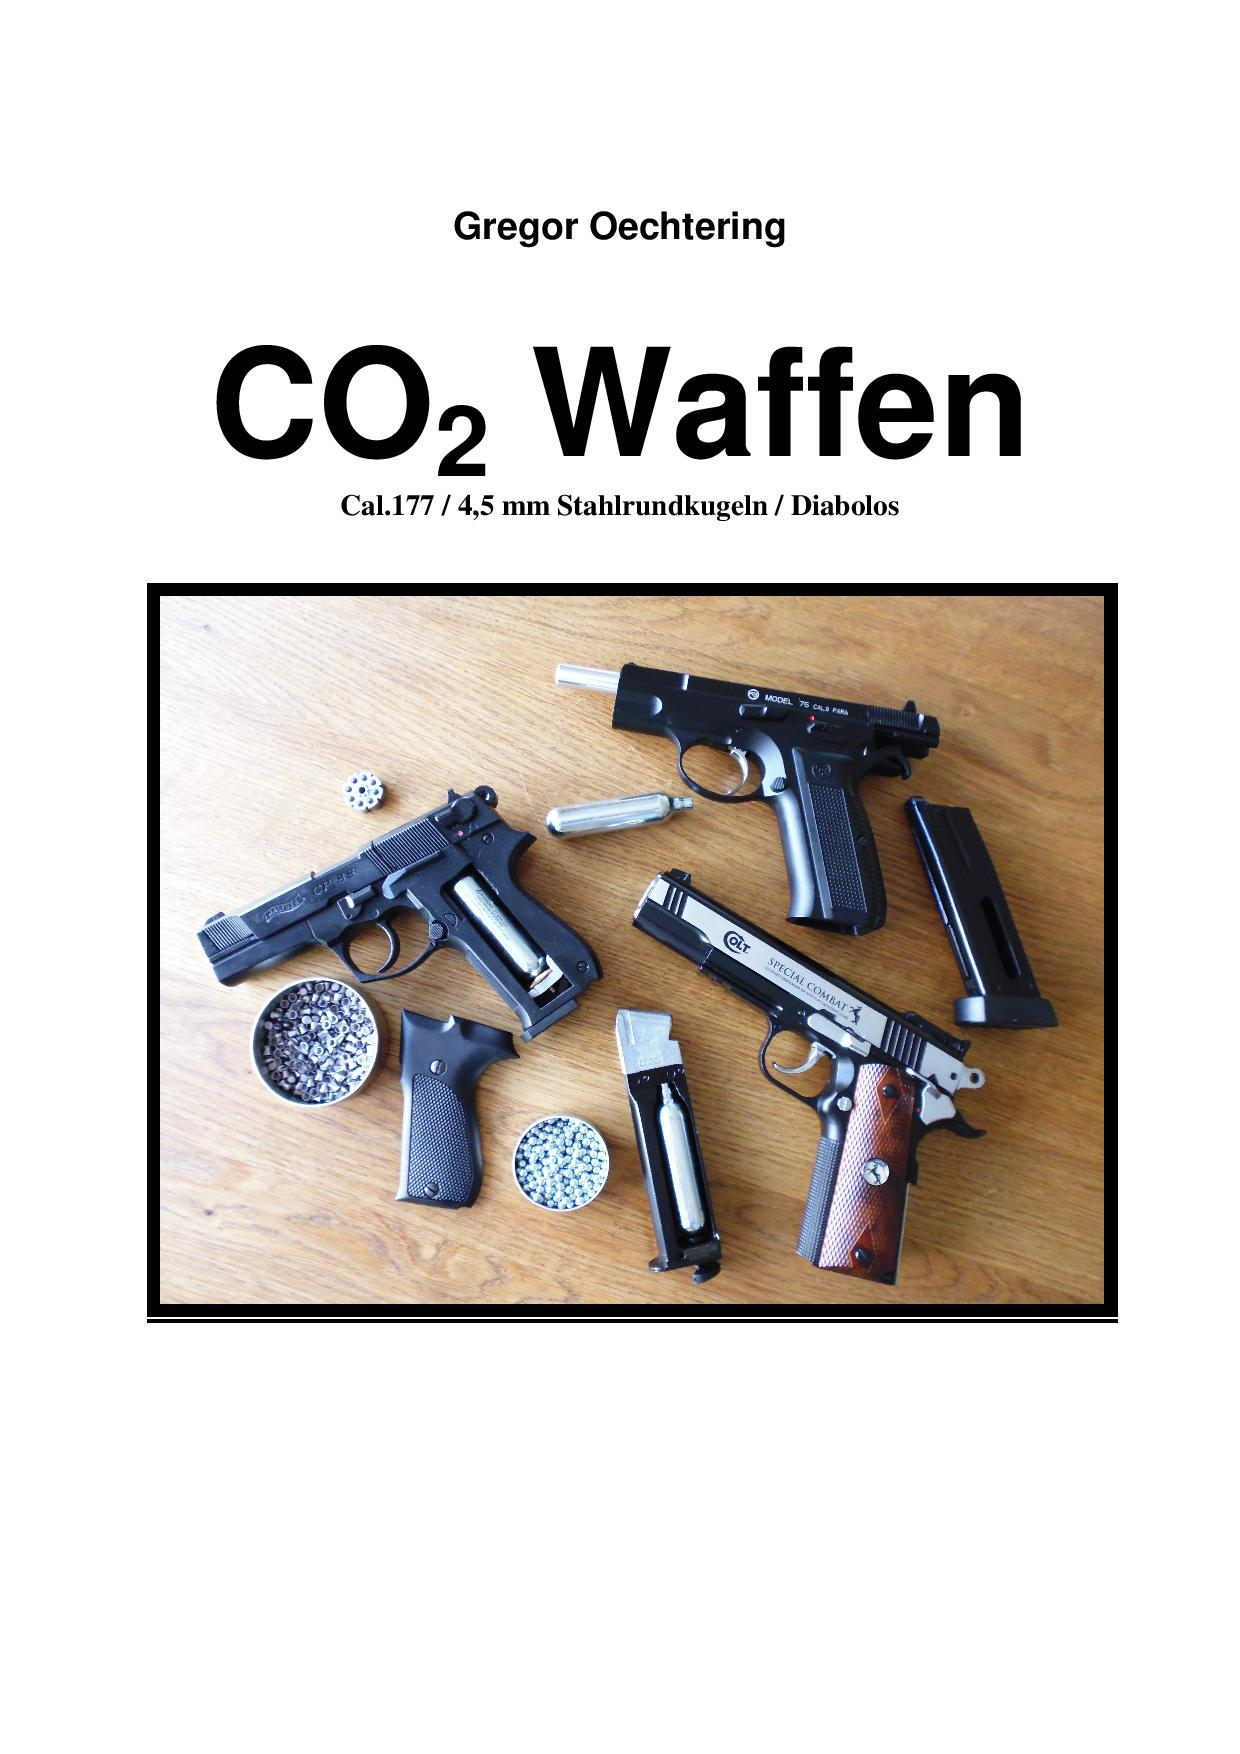 Gregor Oechtering CO2 Waffen Front-page-001.jpg